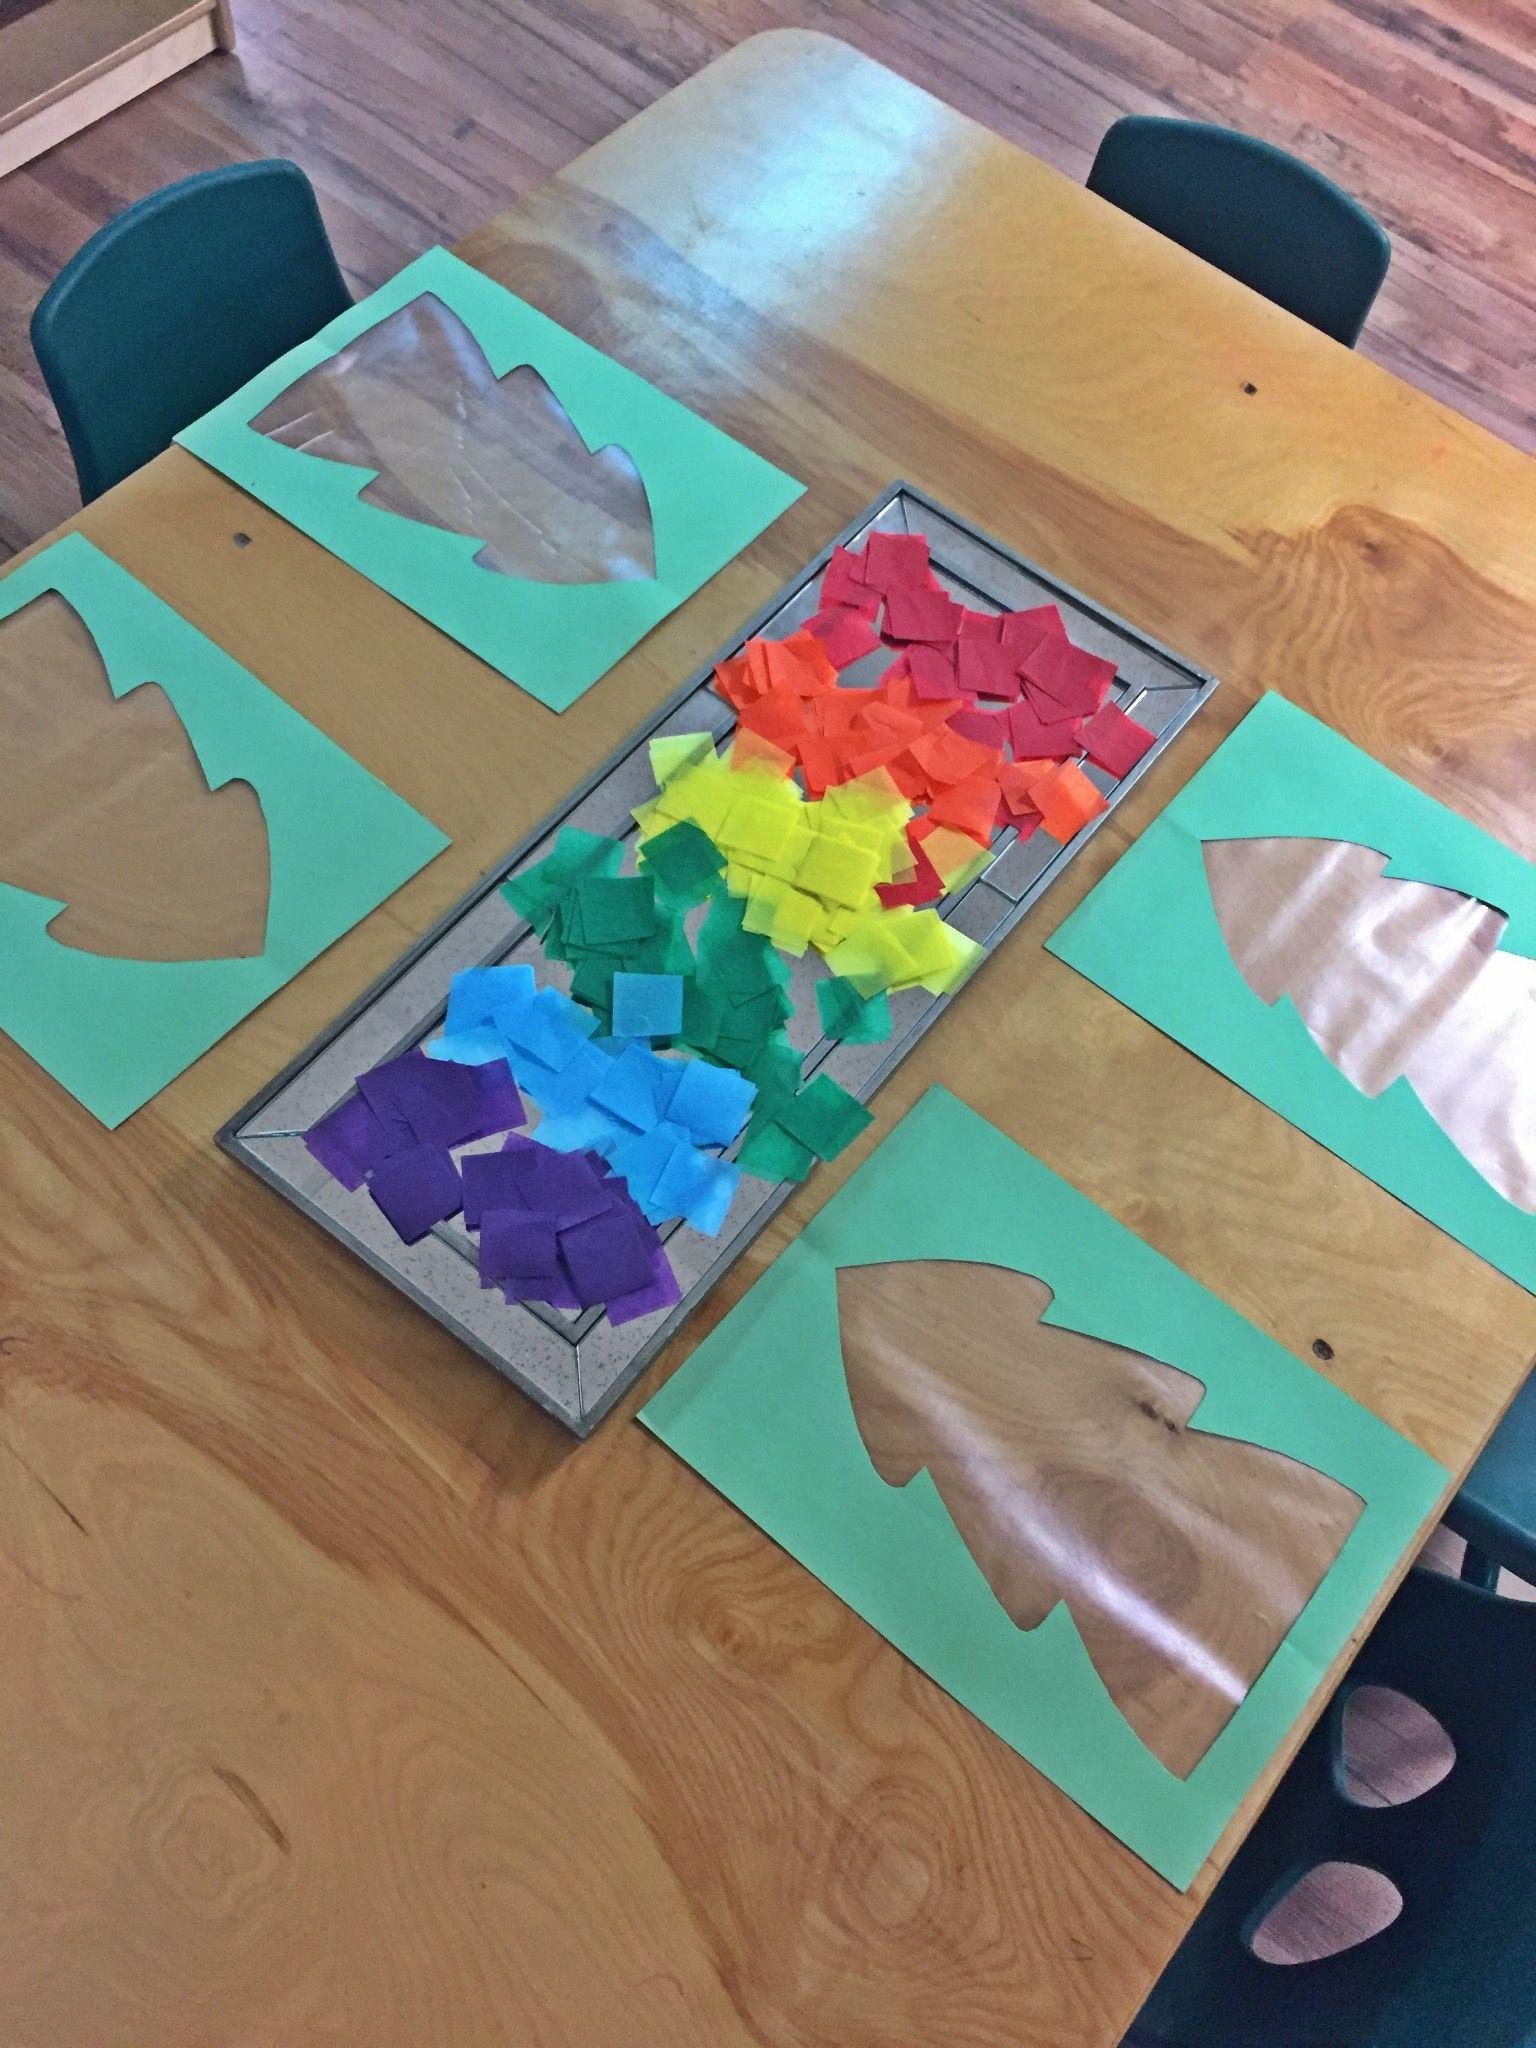 Reggio provocations preschool education process oriented play based